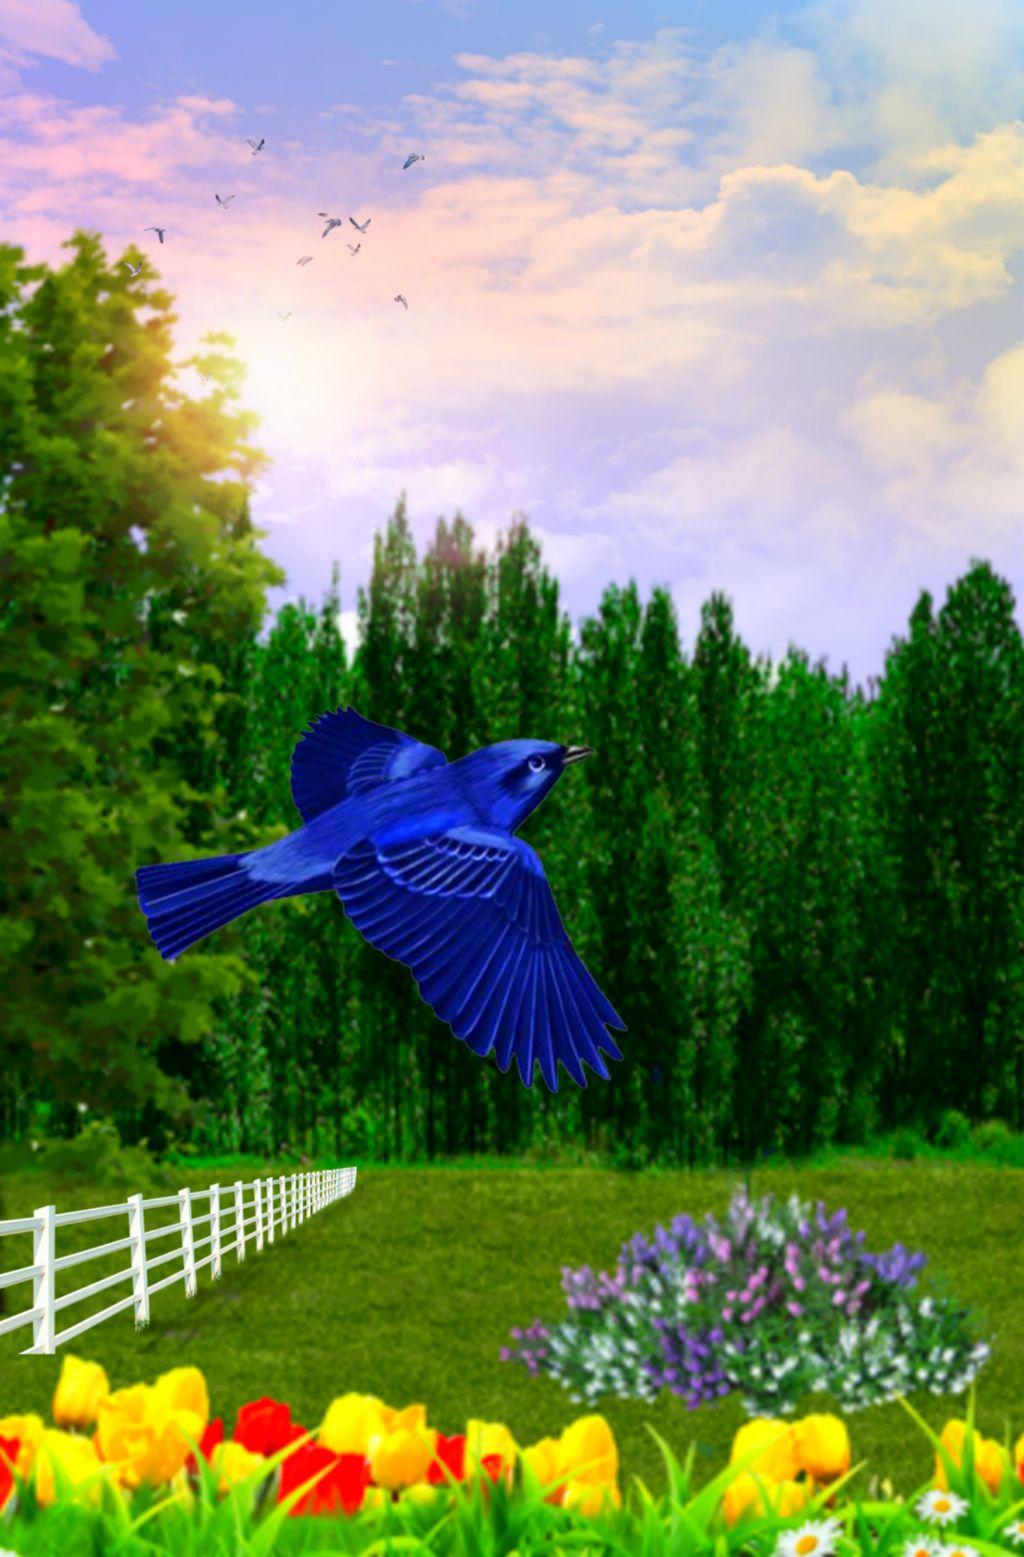 #freetoedit #nature #landscape #garden #forest #skylovers #skyporn #naturesbeauty #colorful #colorlove #picsarteffects #lensflare #editstepbystep #myedit #madewithpicsart